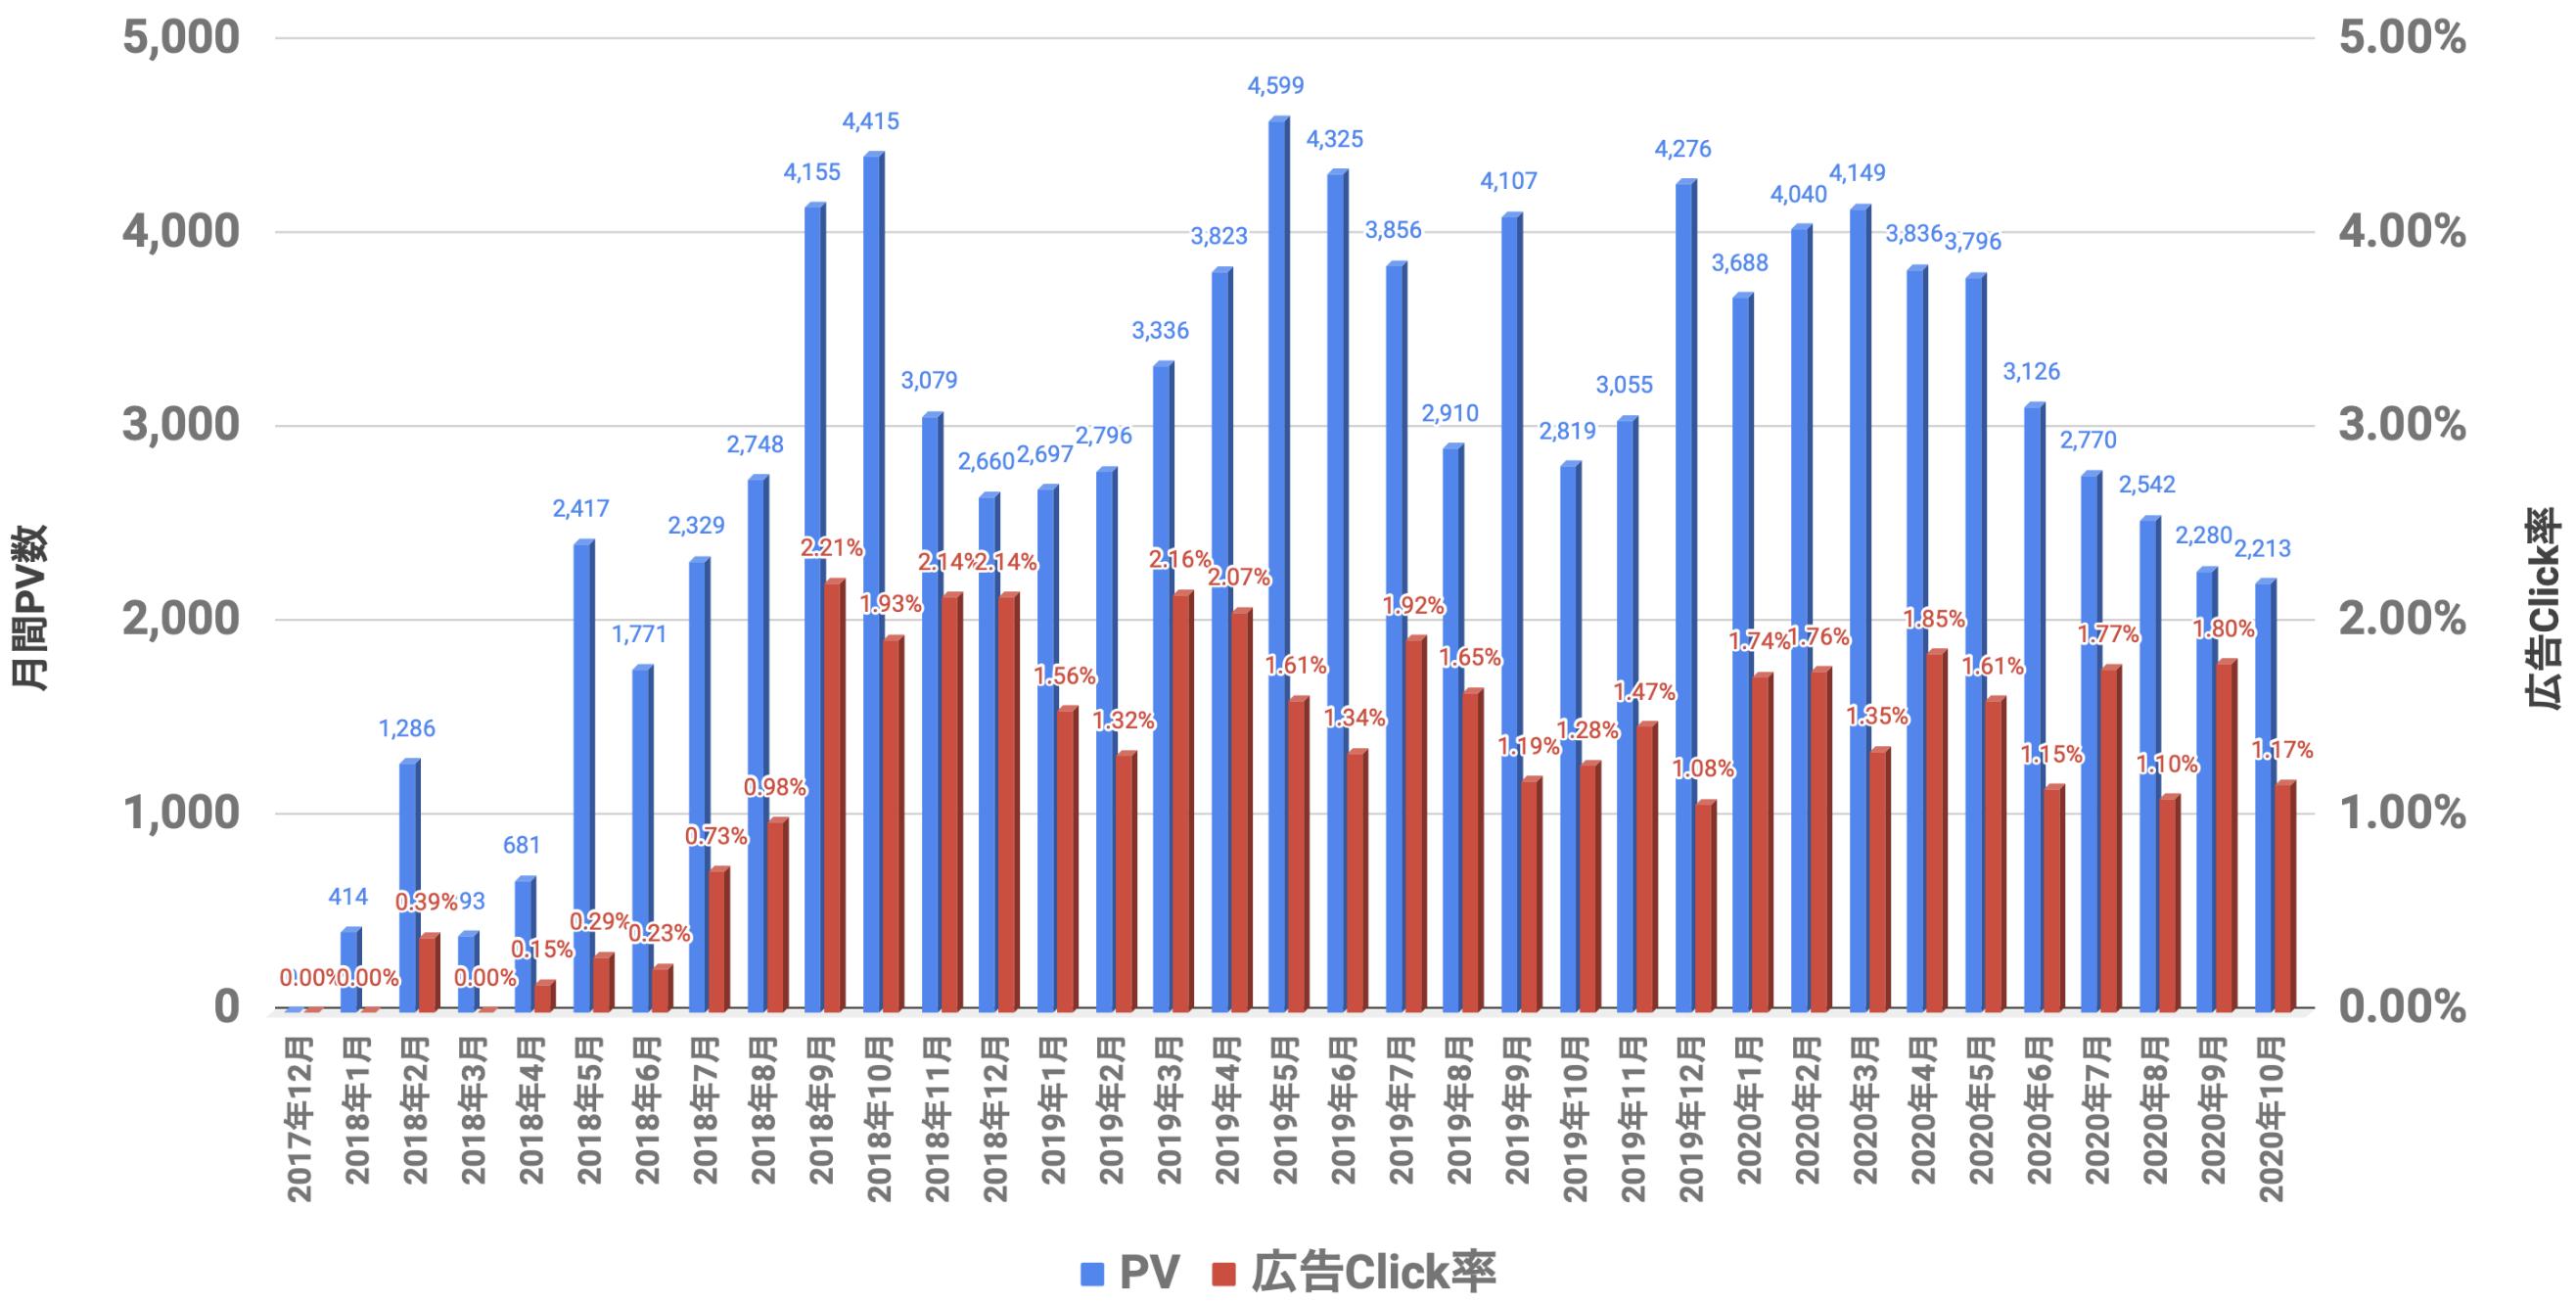 PVと広告Click率 2020年10月